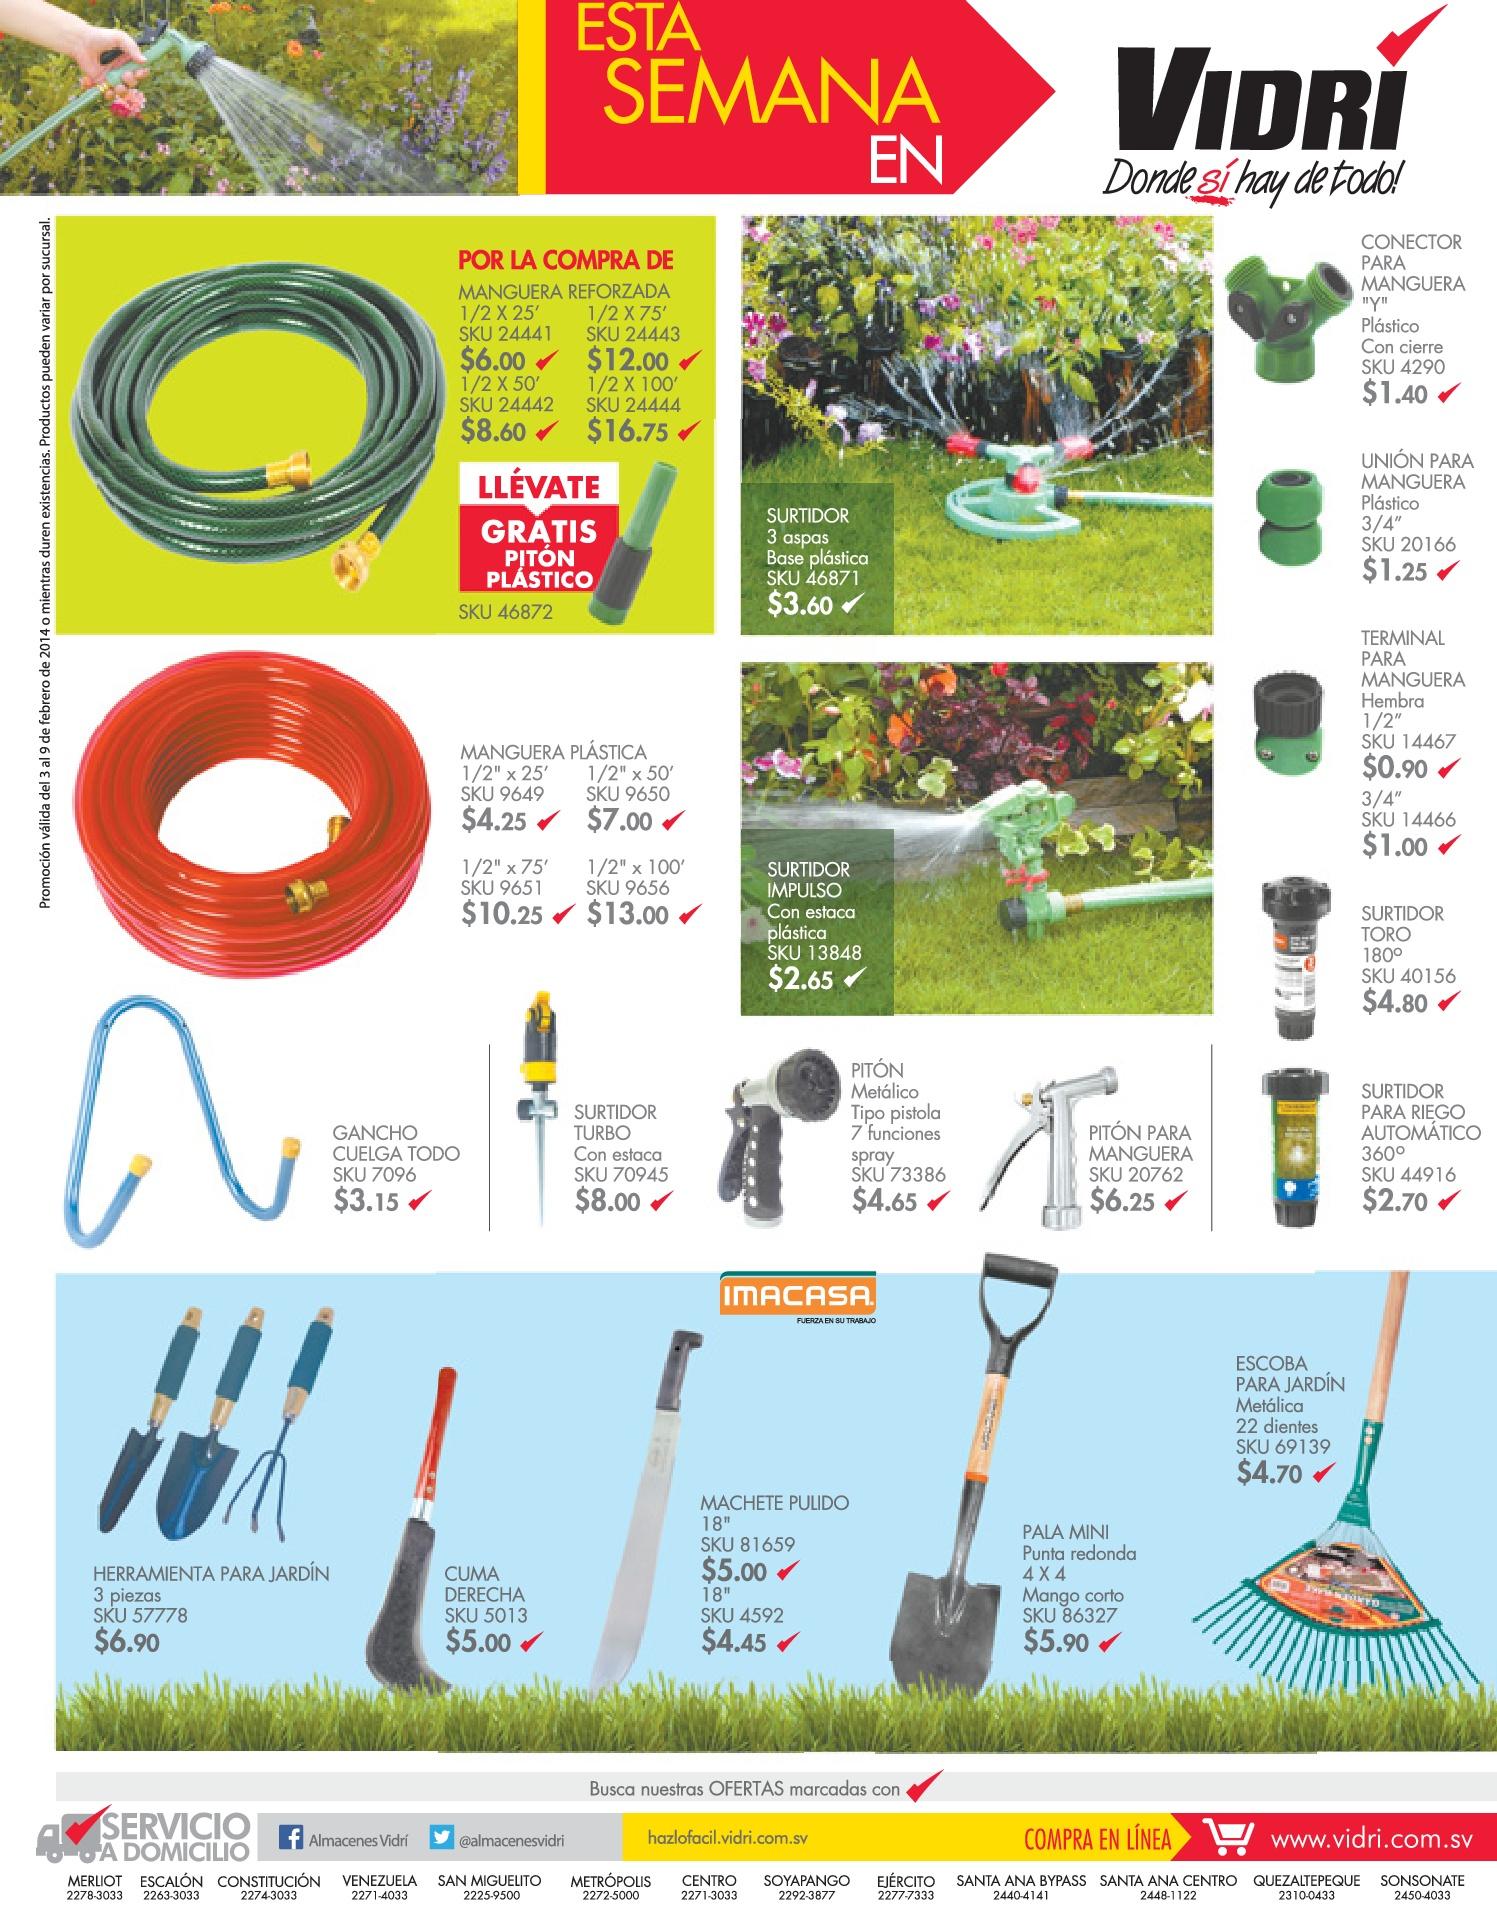 Ferreteria vidri el salvador ofertas for Accesorios jardineria